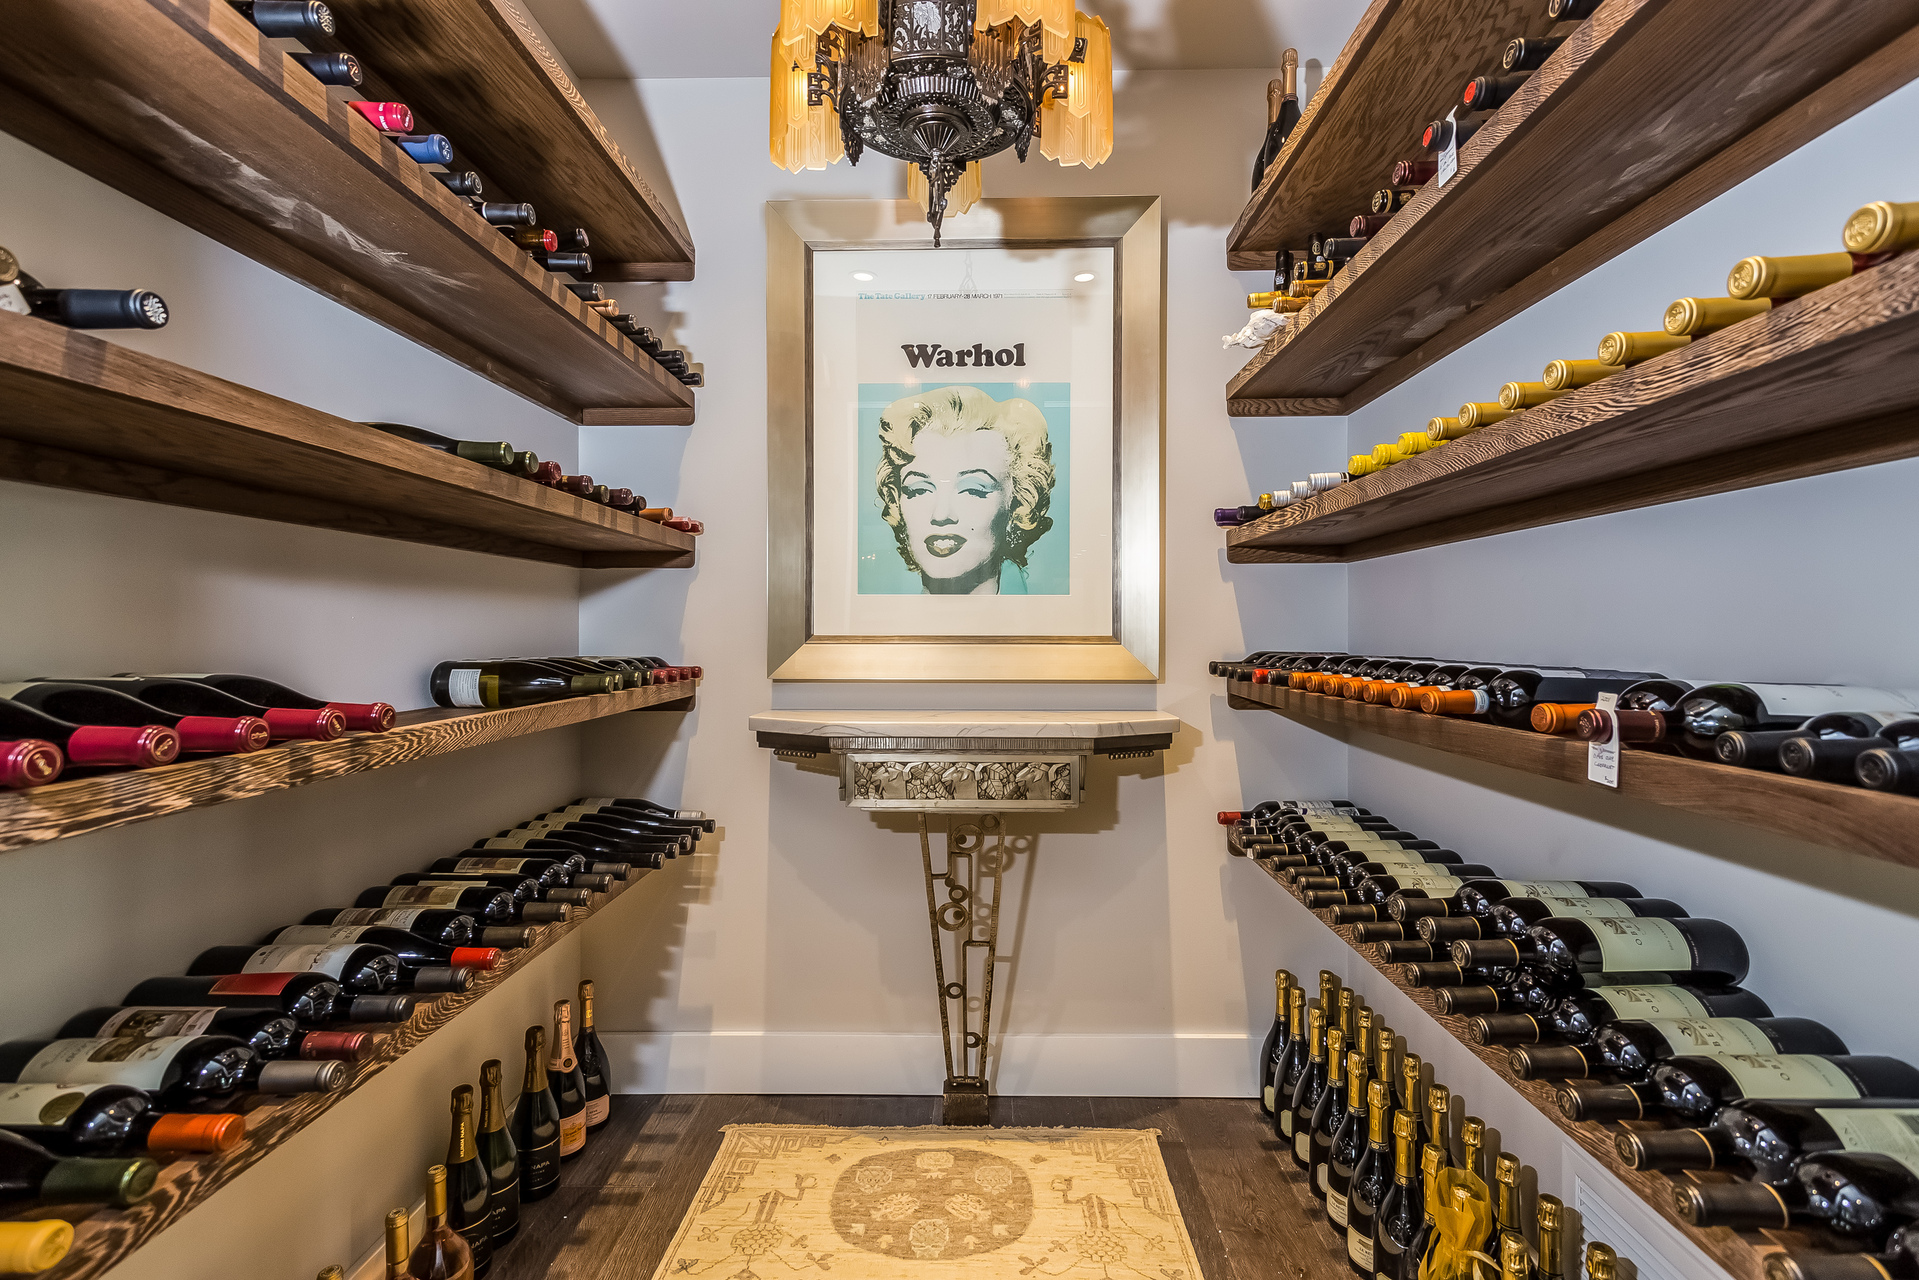 042-Wine_Cellar-4845677-medium